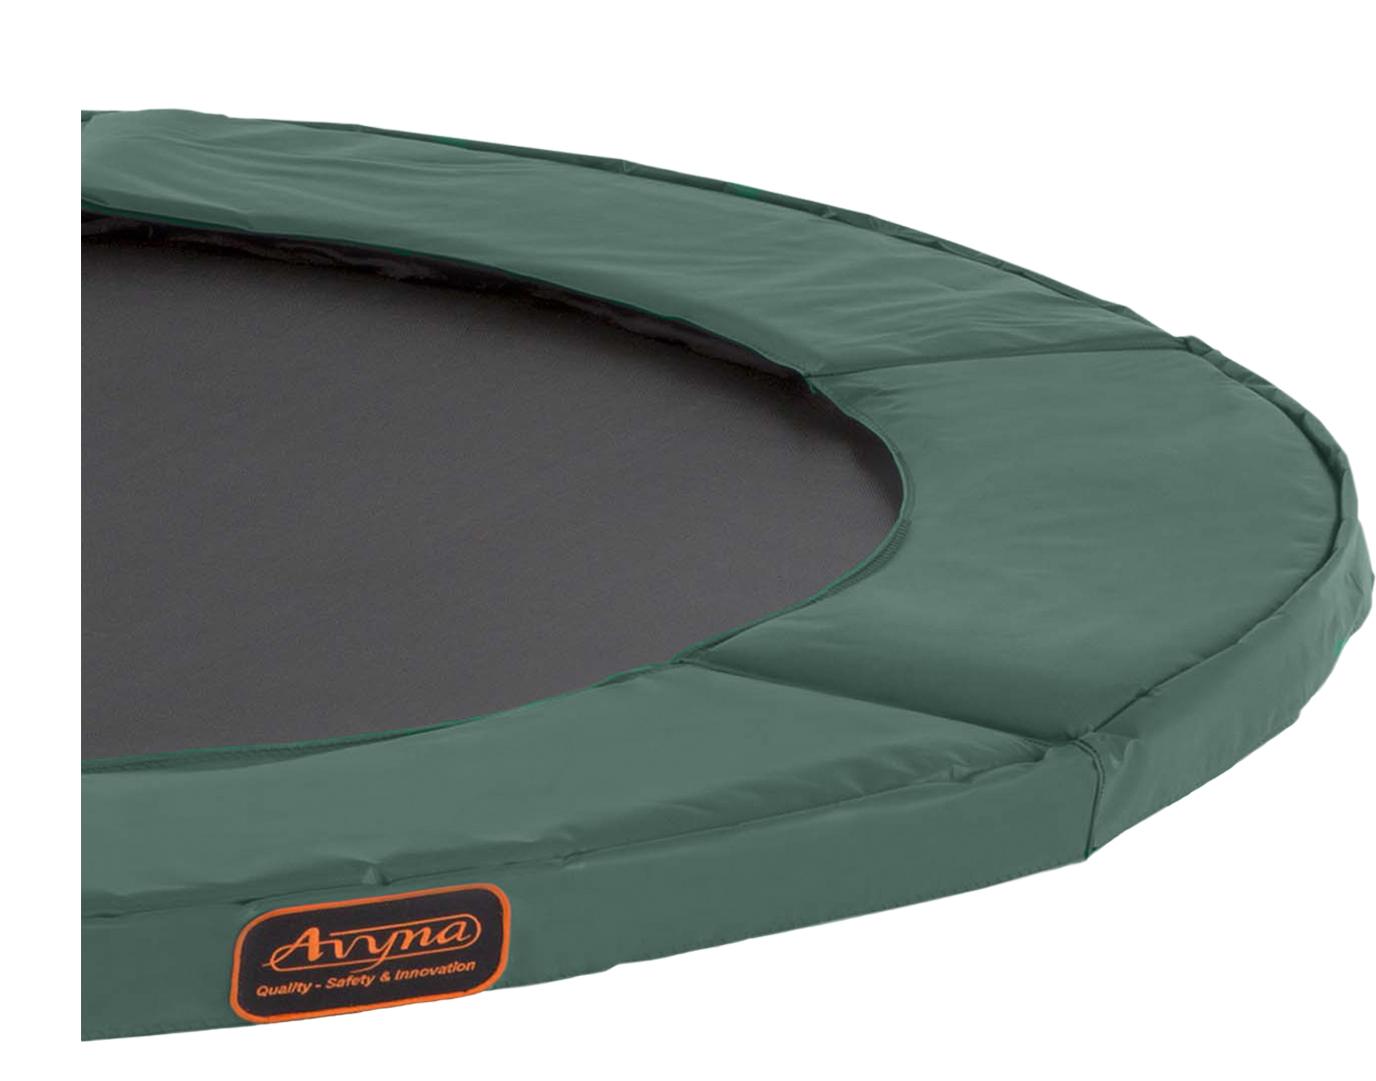 Avyna Proline Trampolinerand 244 cm Groen